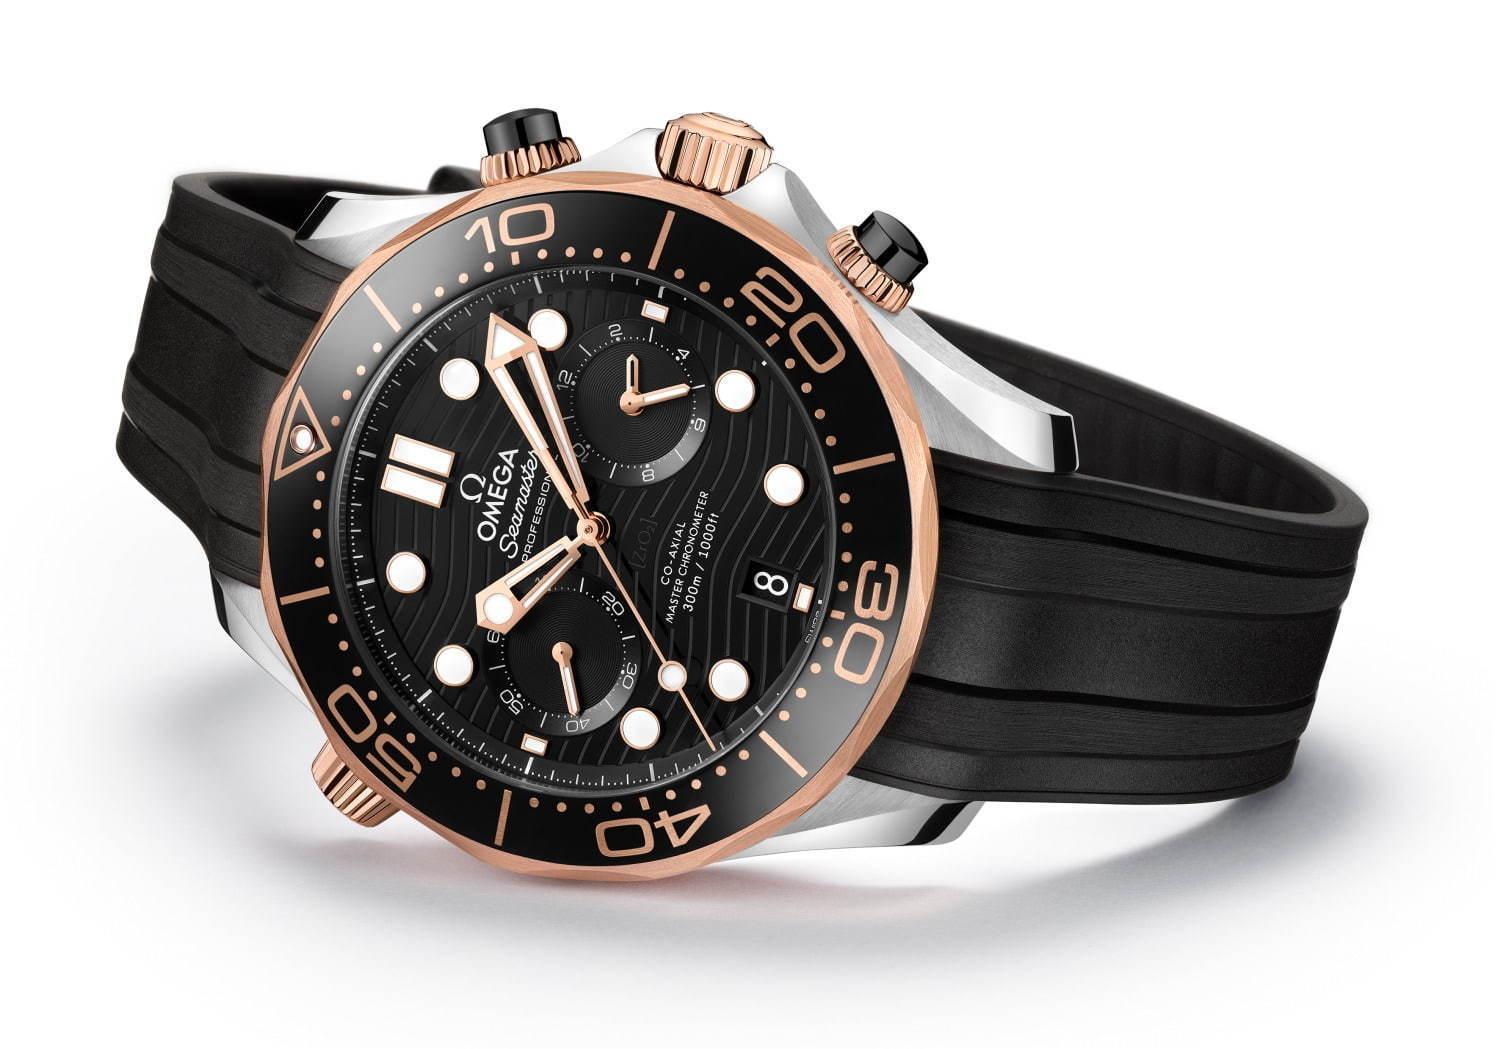 sports shoes 504c6 86e76 オメガ人気メンズ腕時計「シーマスター ダイバー300M」から新 ...